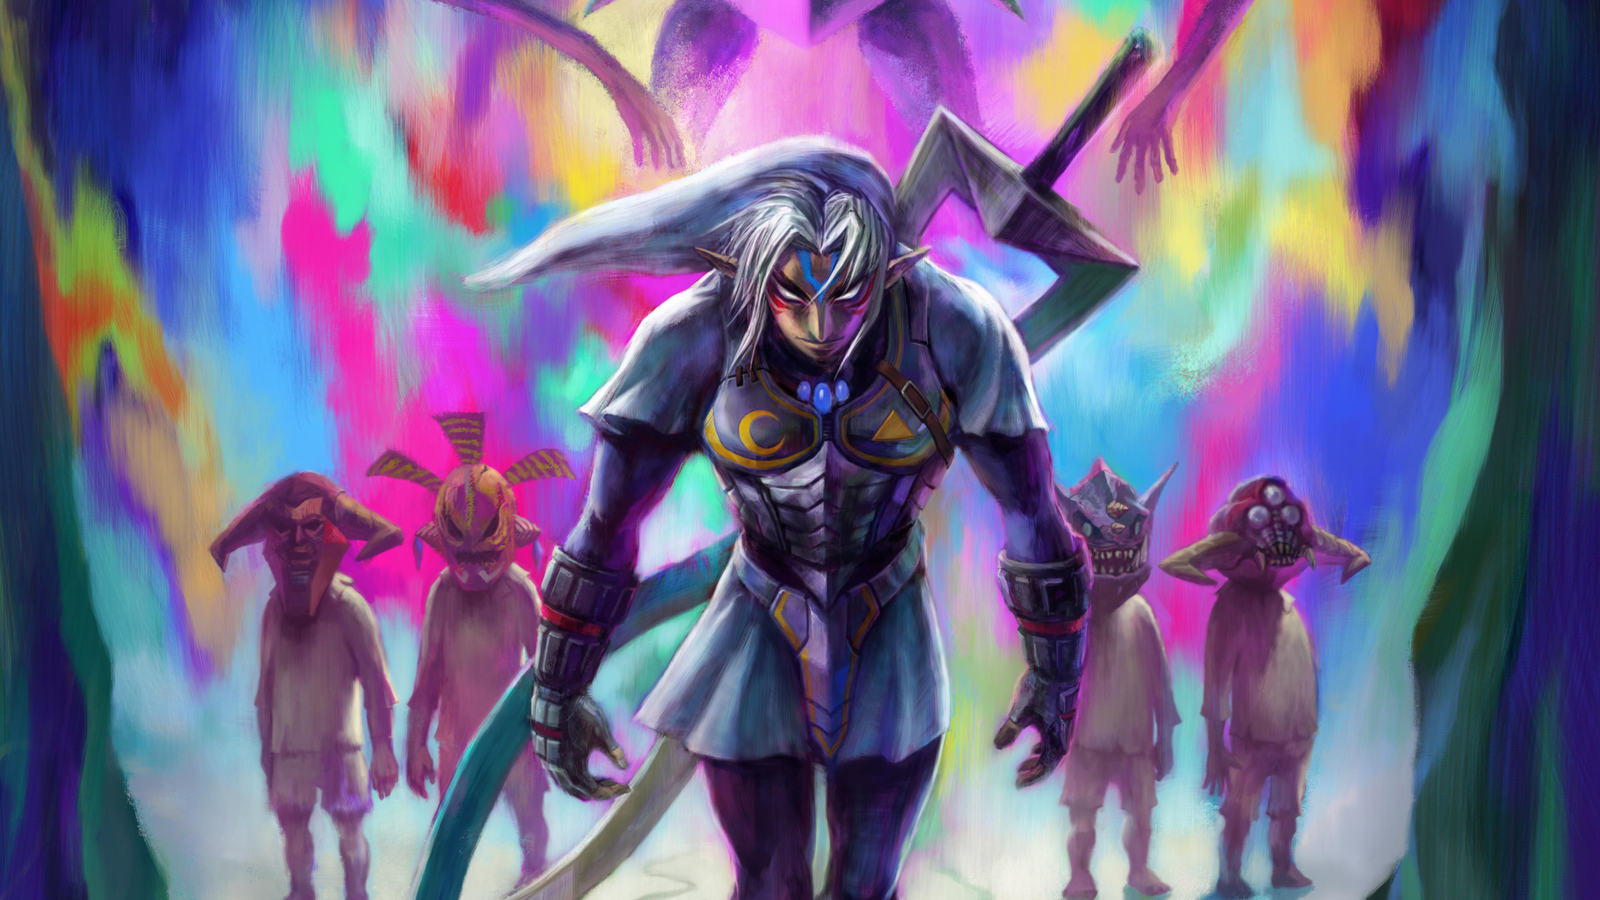 1600x900 The Legend Of Zelda Majoras Mask 1600x900 Resolution Hd 4k